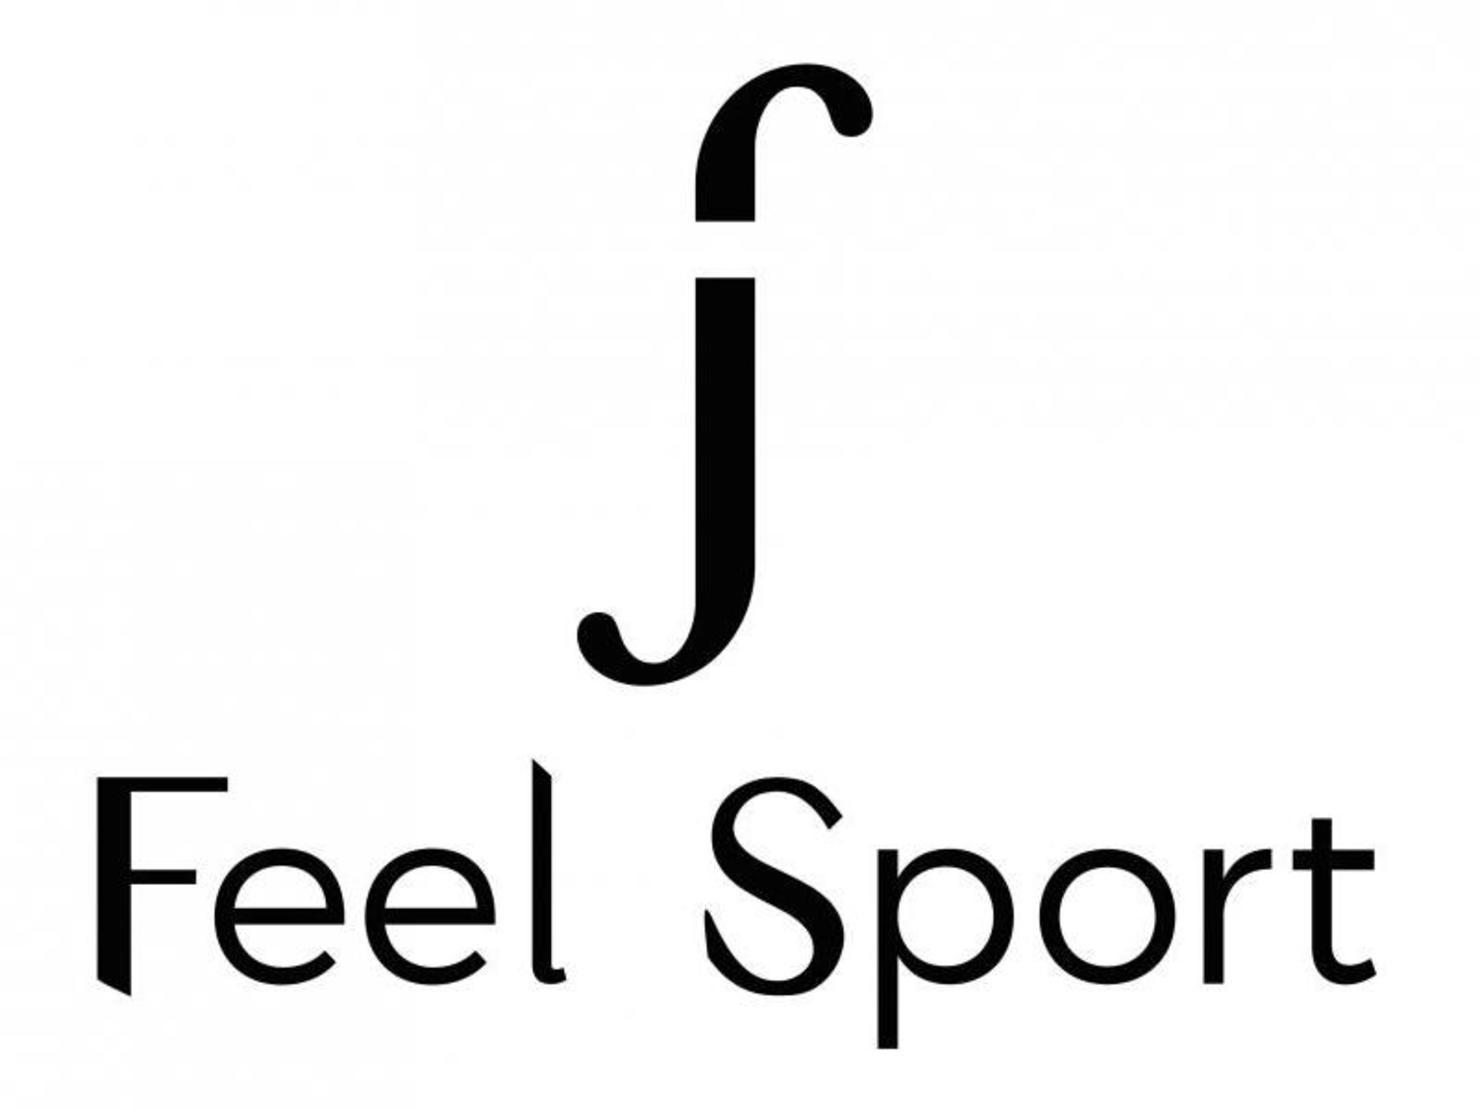 feel sport orl ans tarifs avis horaires essai gratuit. Black Bedroom Furniture Sets. Home Design Ideas